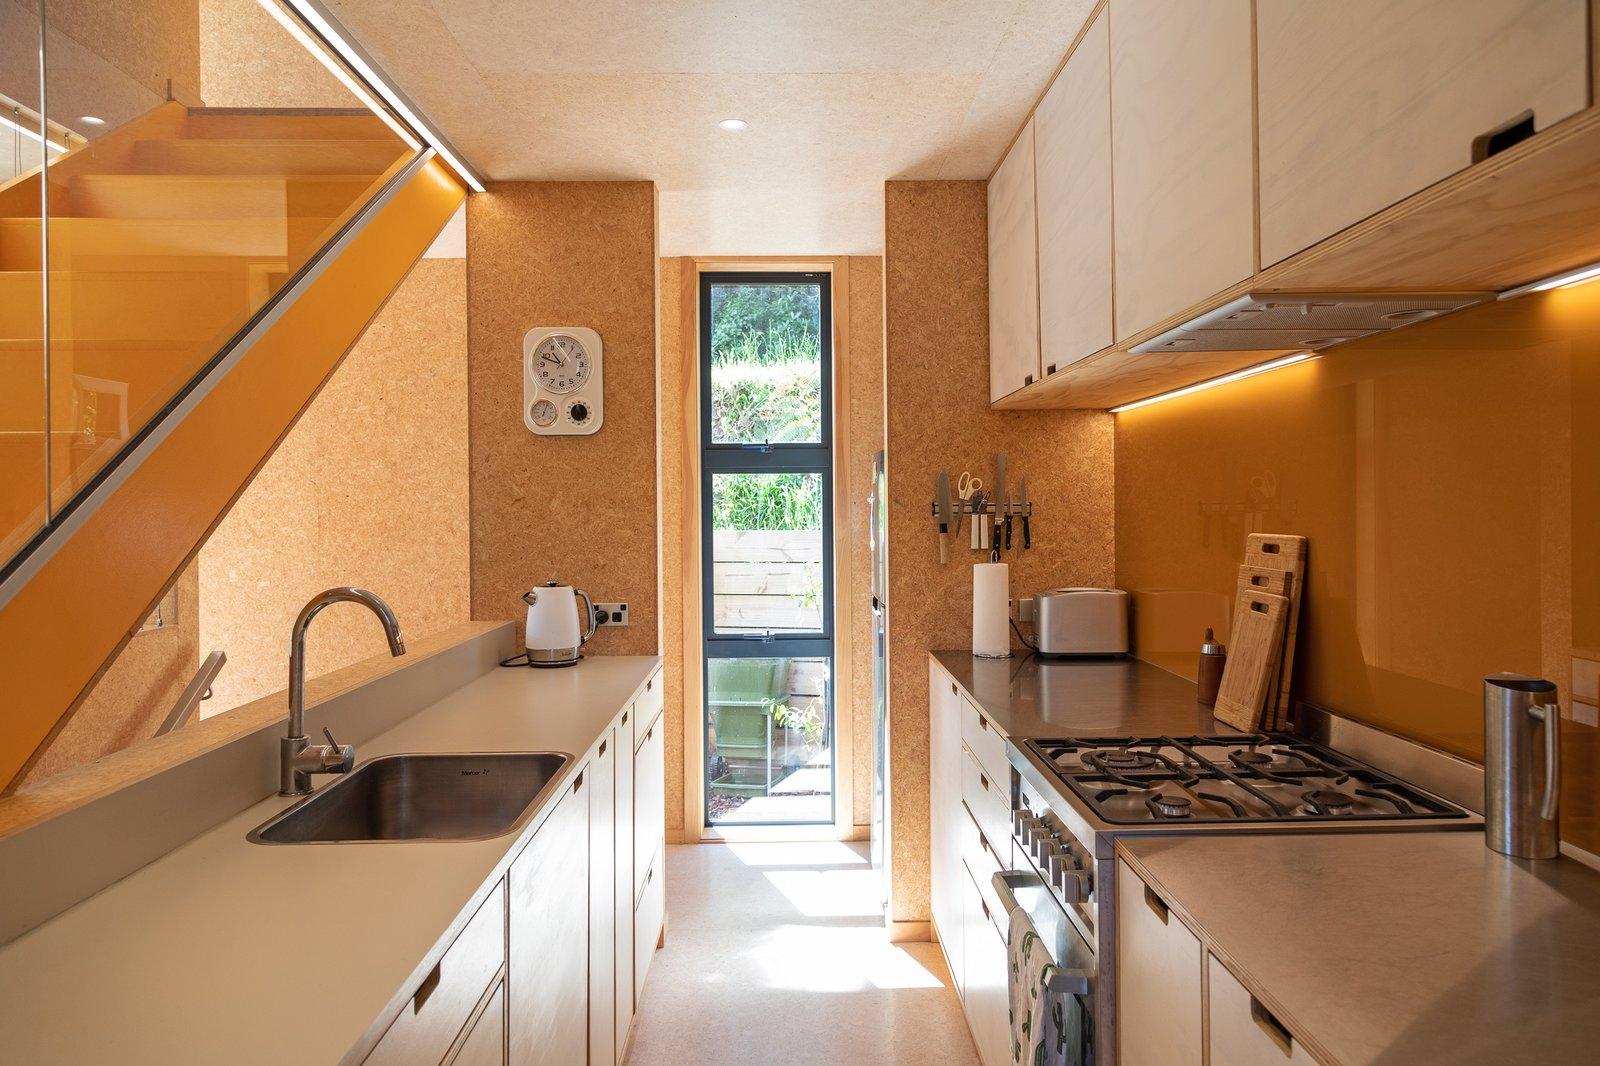 Kitchen at Thornton House by Bonnifait+Giesen.